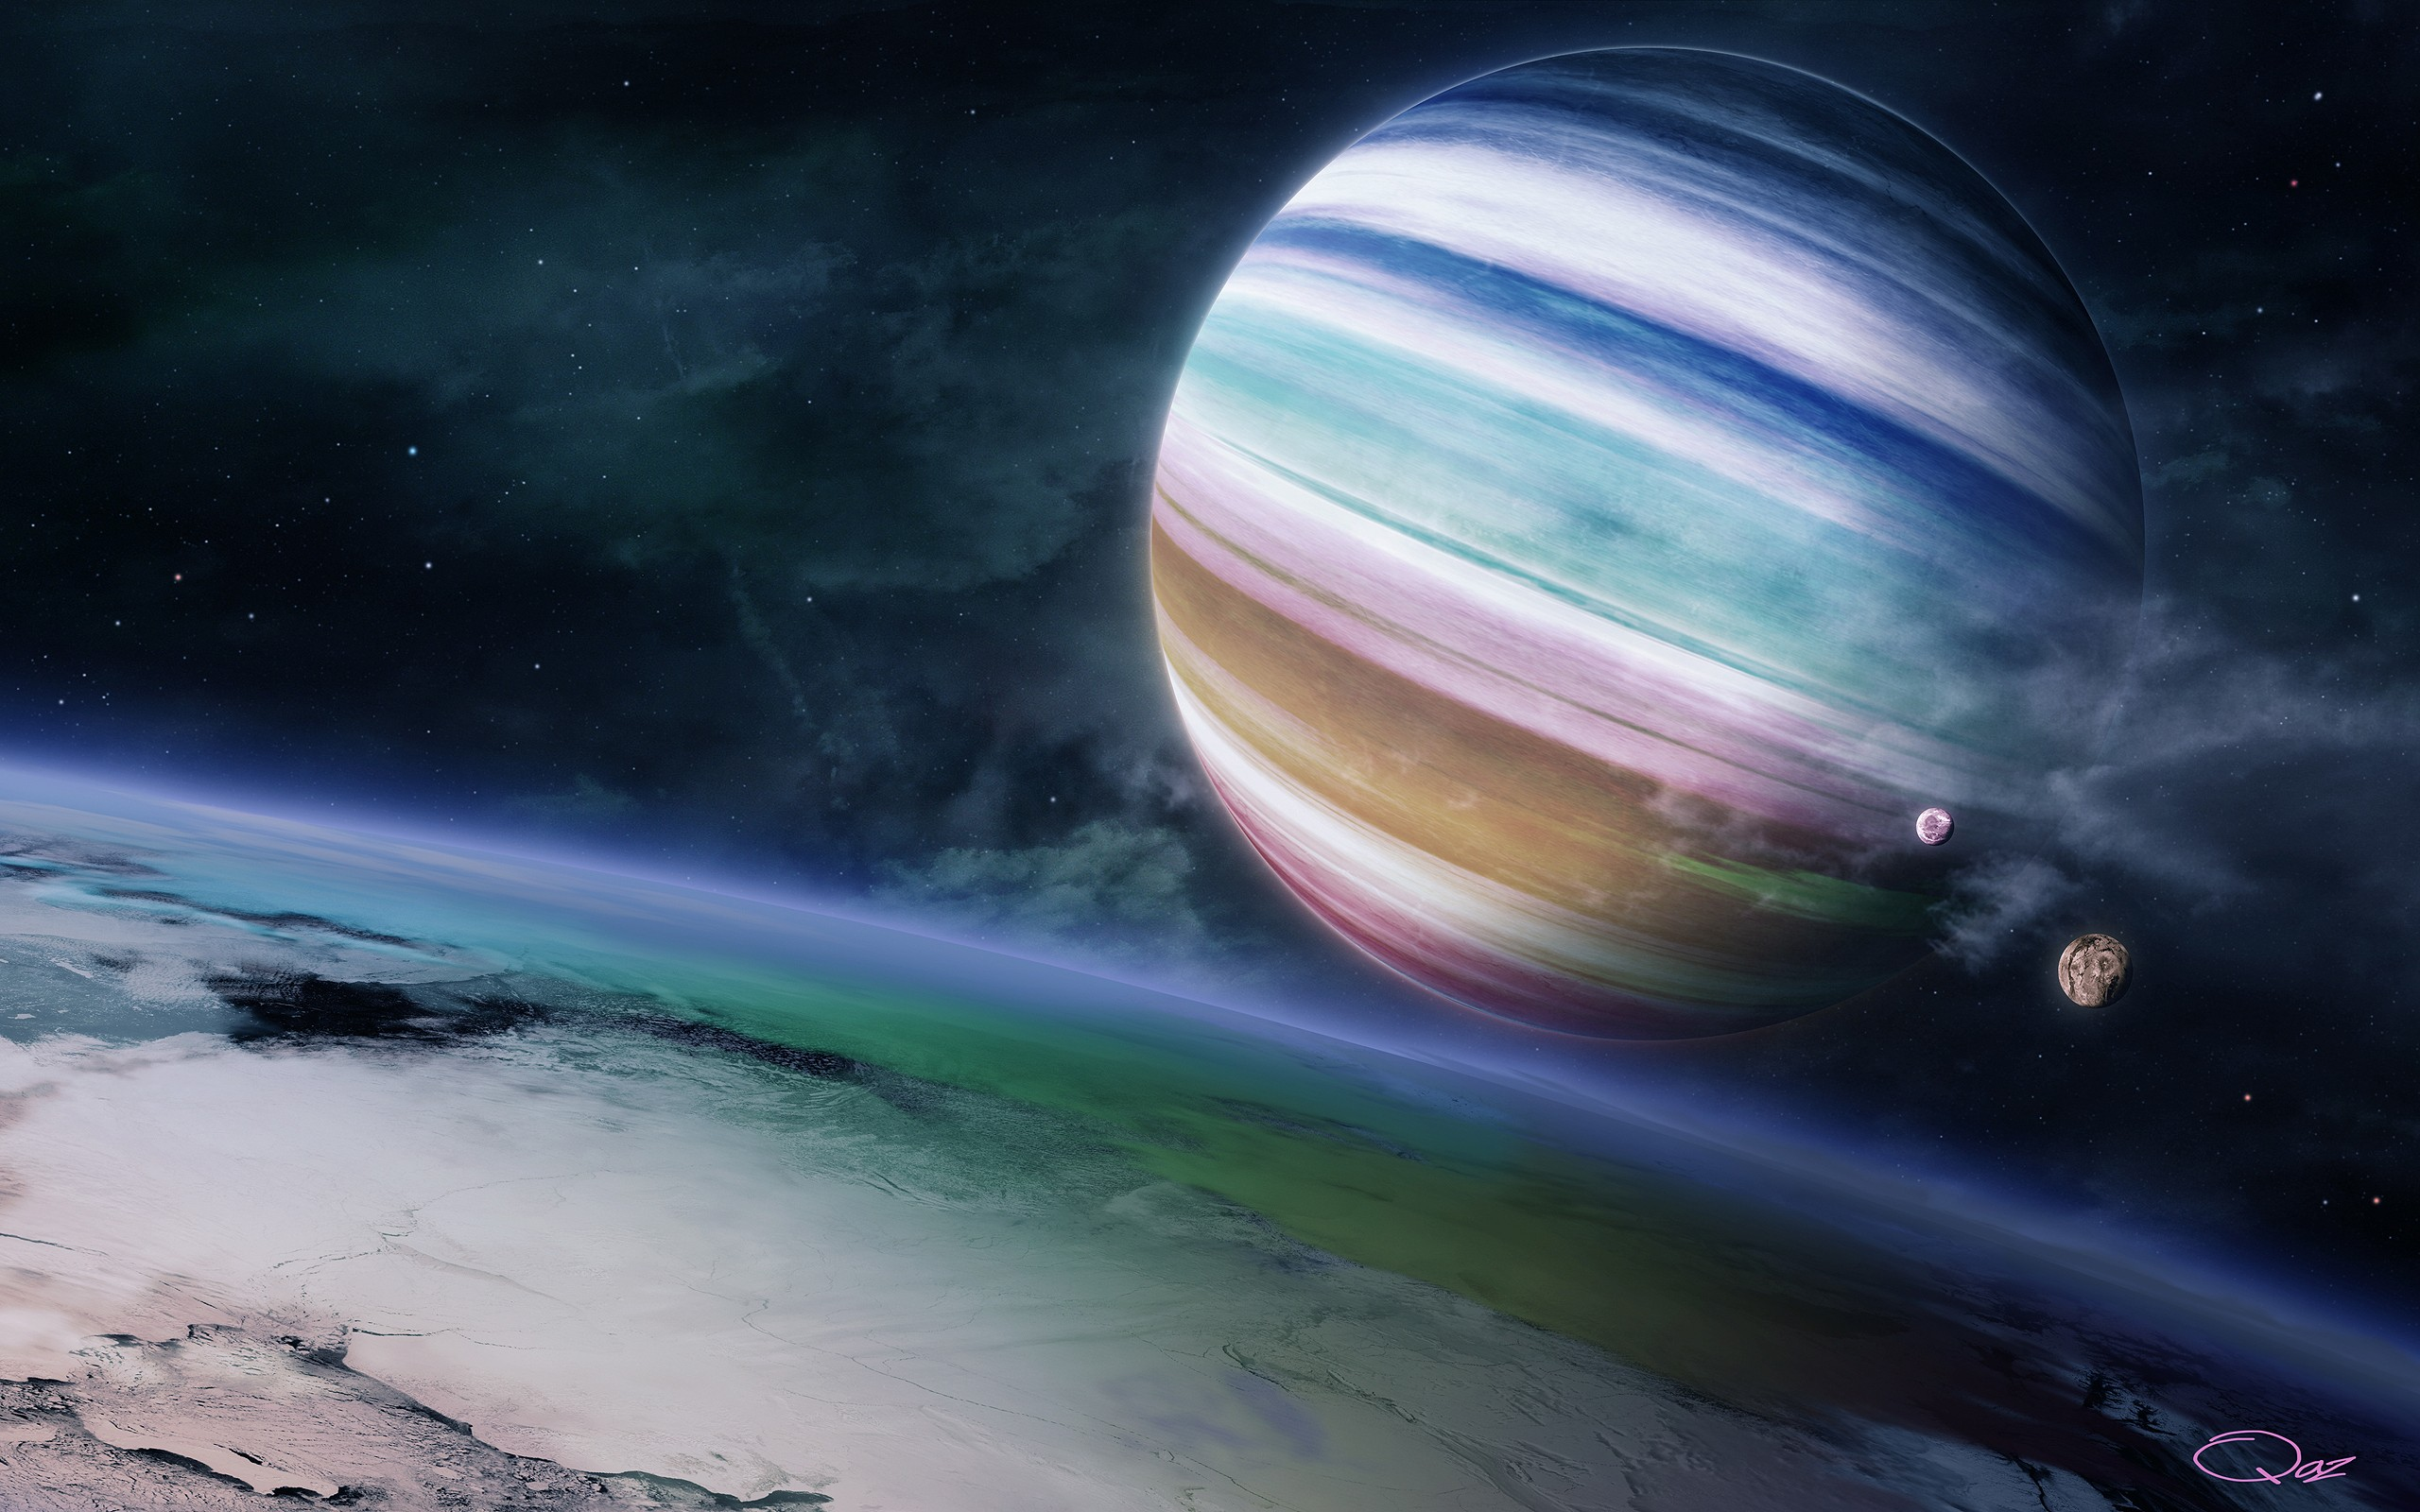 General 2560x1600 planet space digital art QAuZ space art